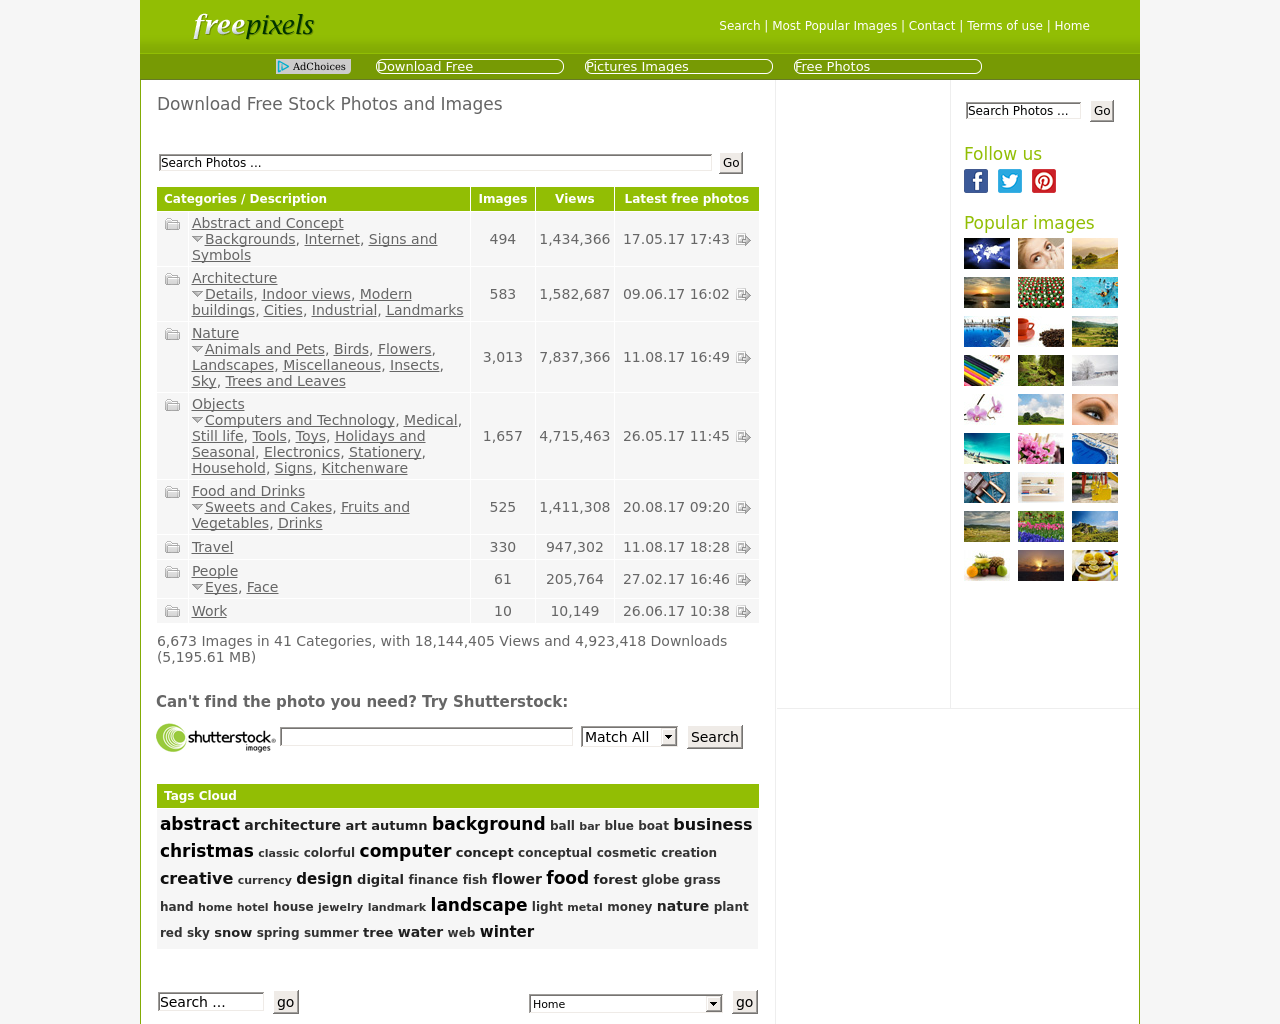 FreePixels-Advertising-Reviews-Pricing